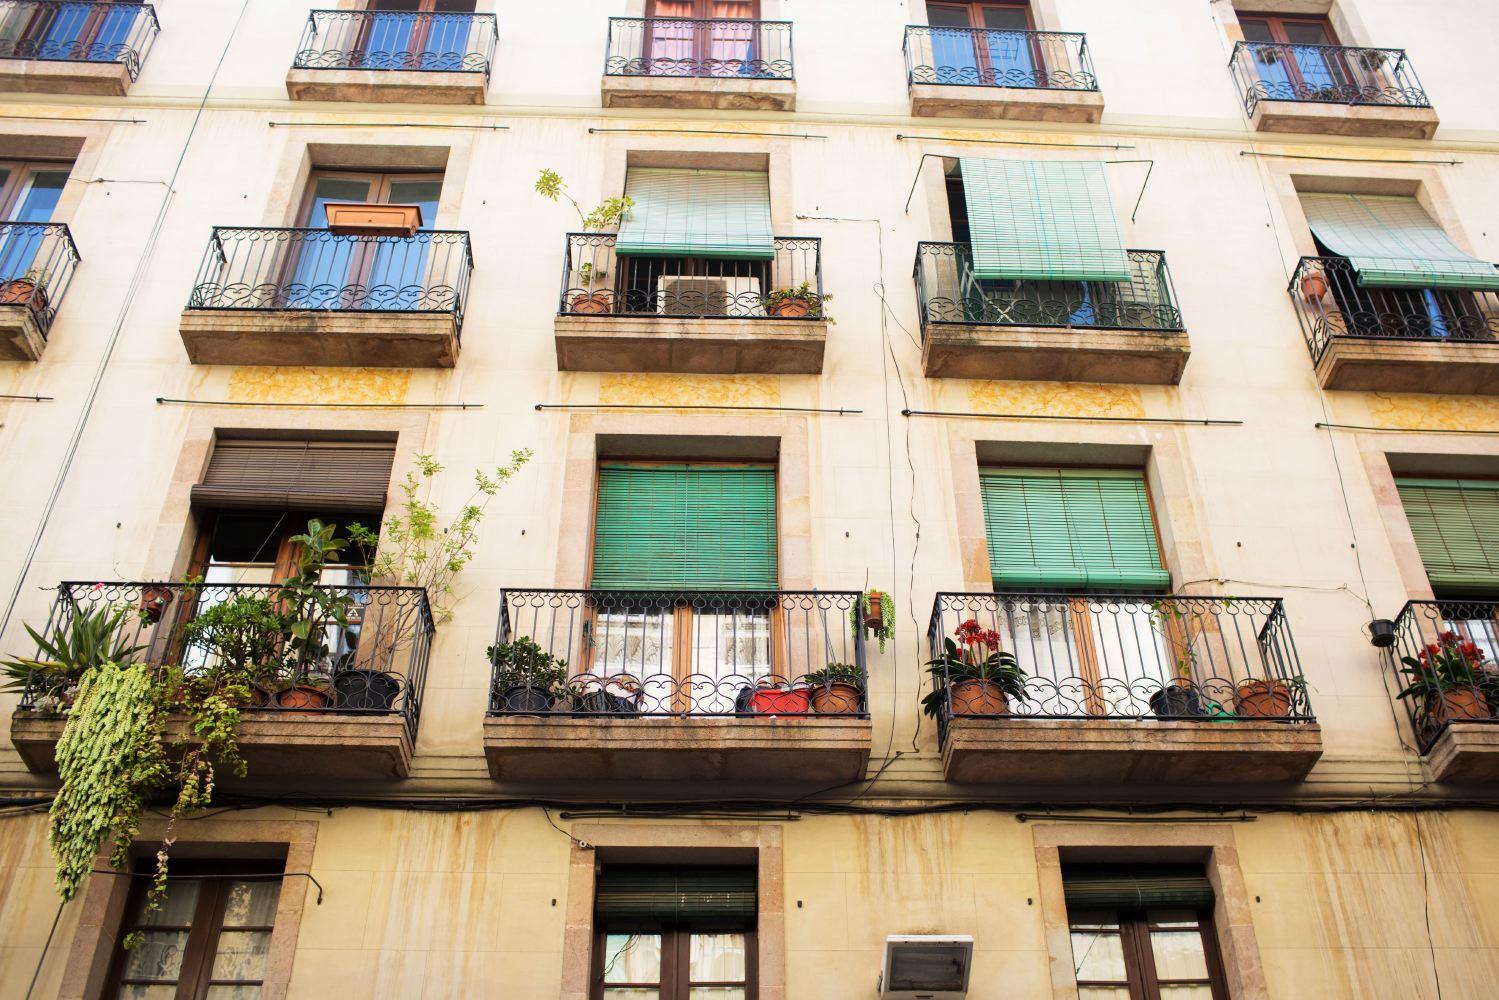 Barcelona | You've Got Flair